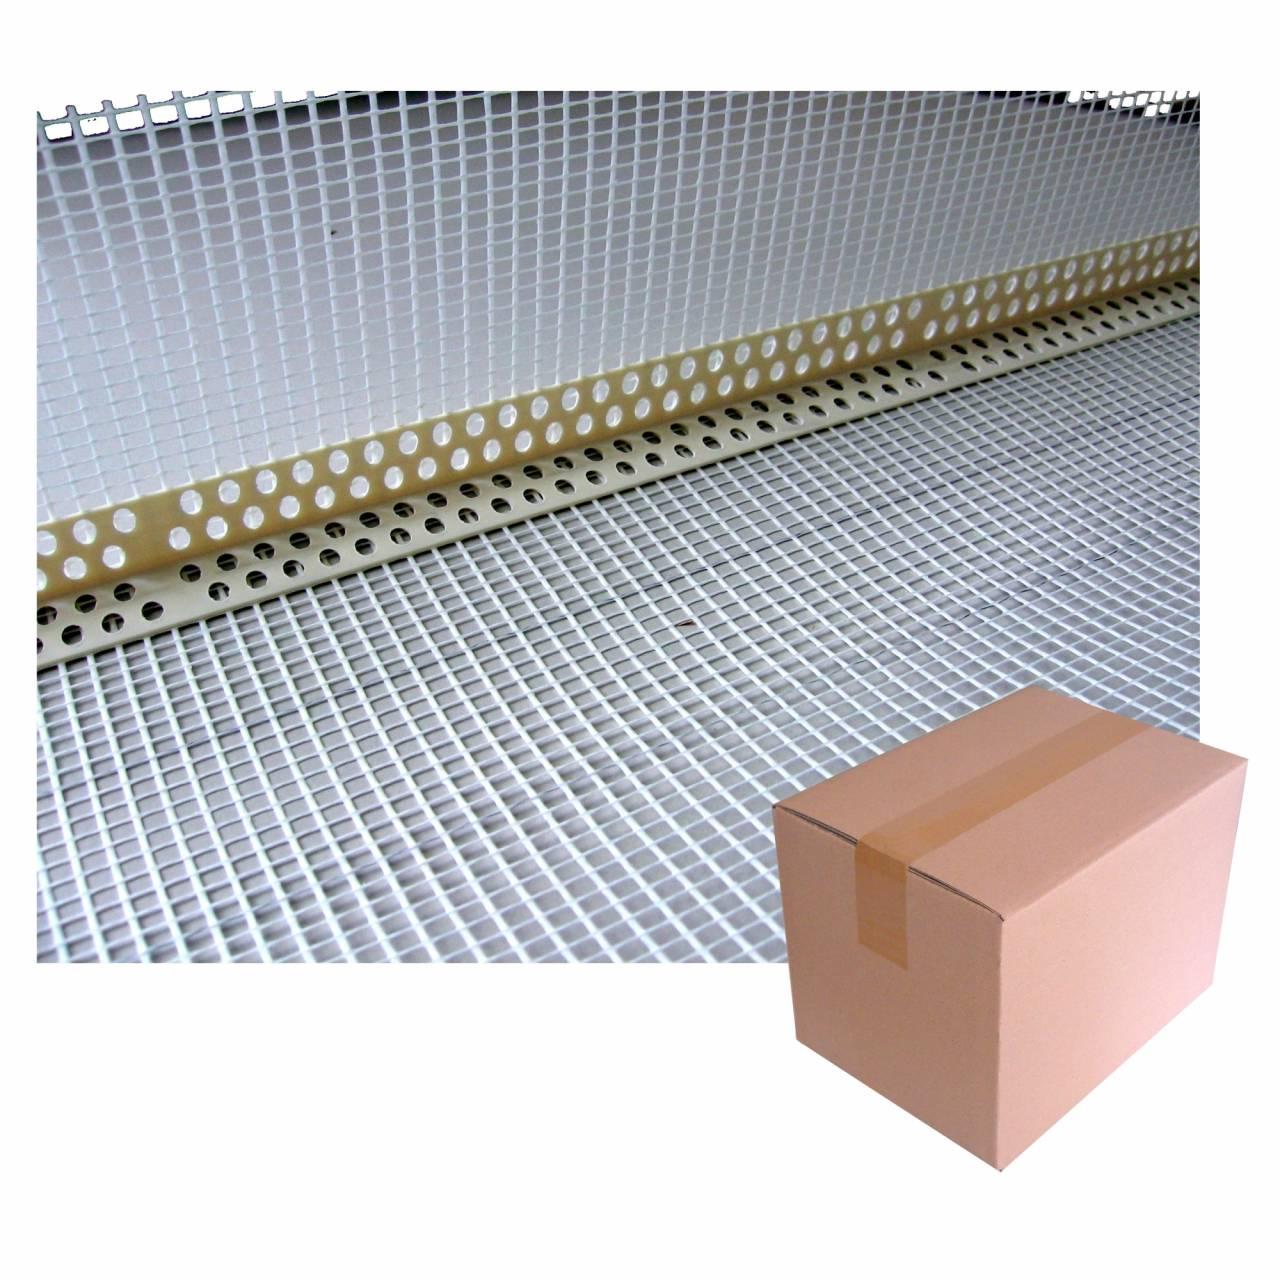 PVC-Eckwinkel 2,5 m, 100x150 Gewebe gelb / Krt a 250 lfm